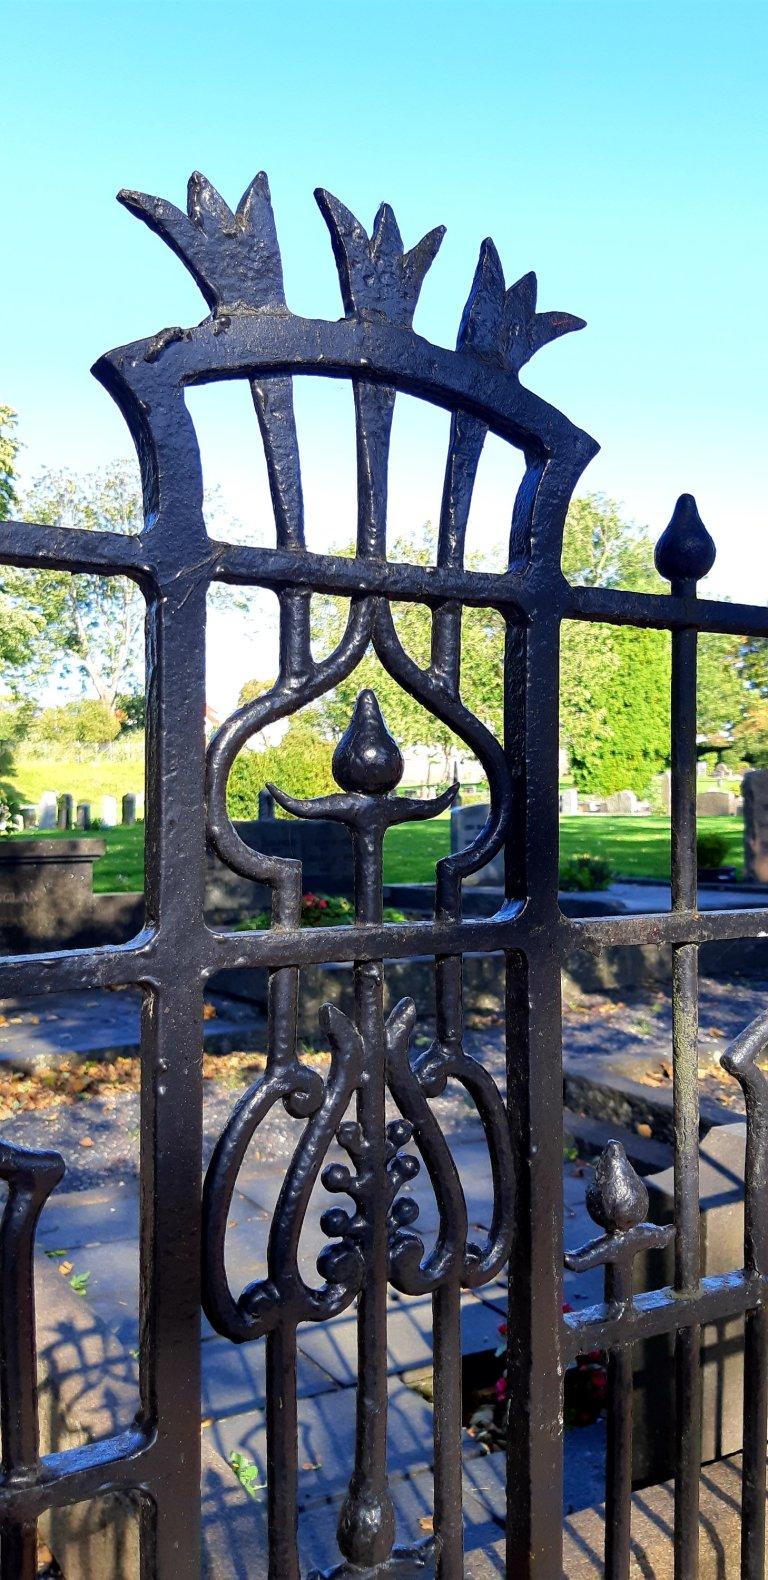 Iron fence details